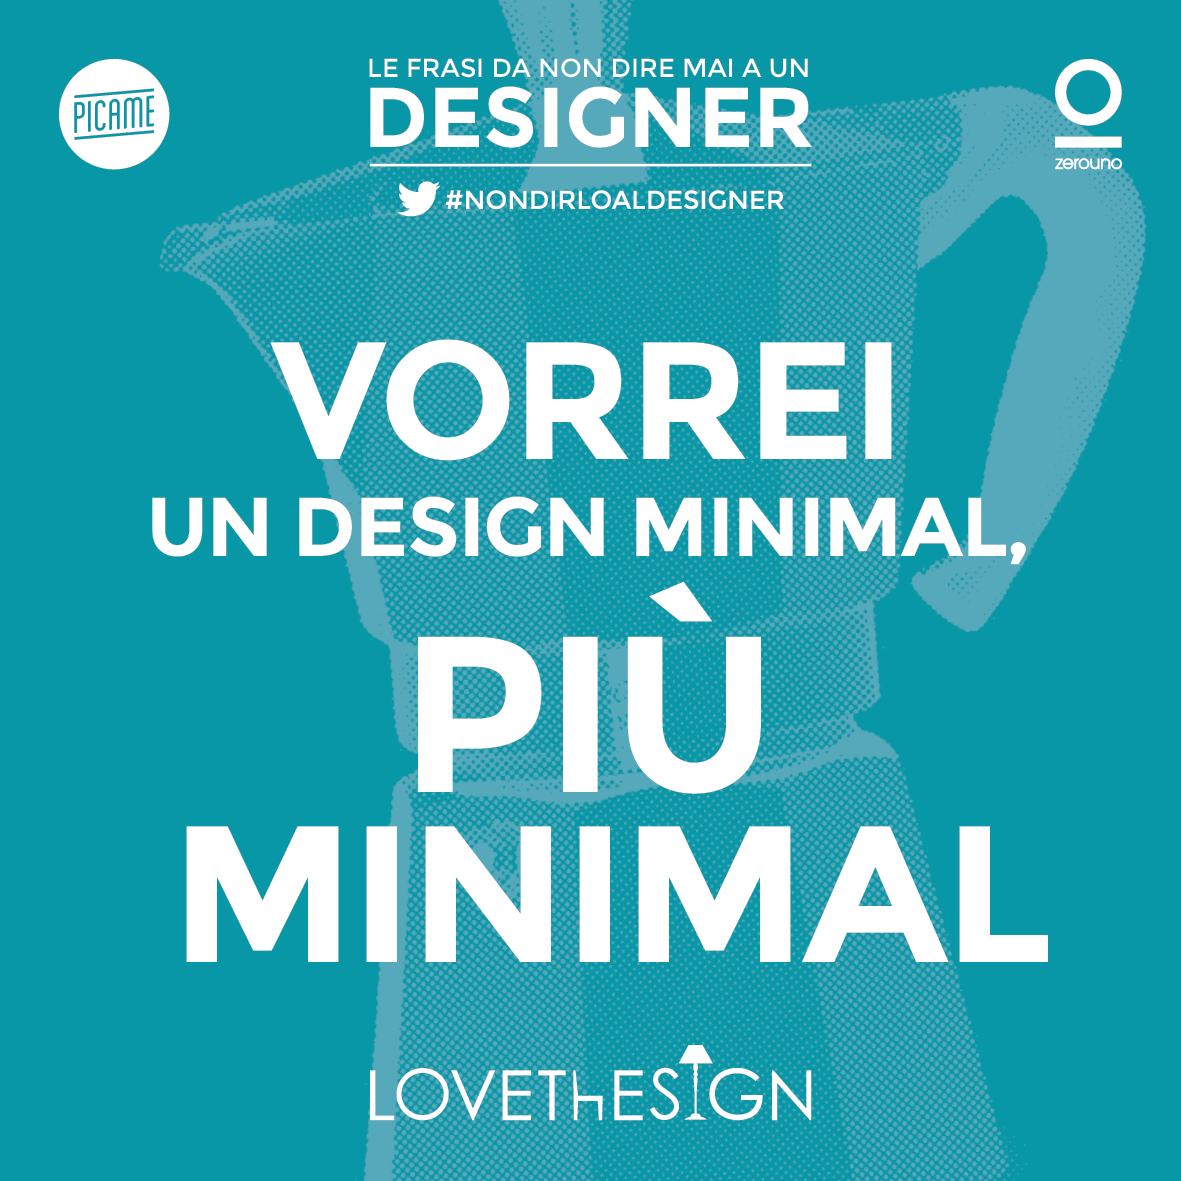 NonDirloalDesigner-Picame-Lovethesign-2